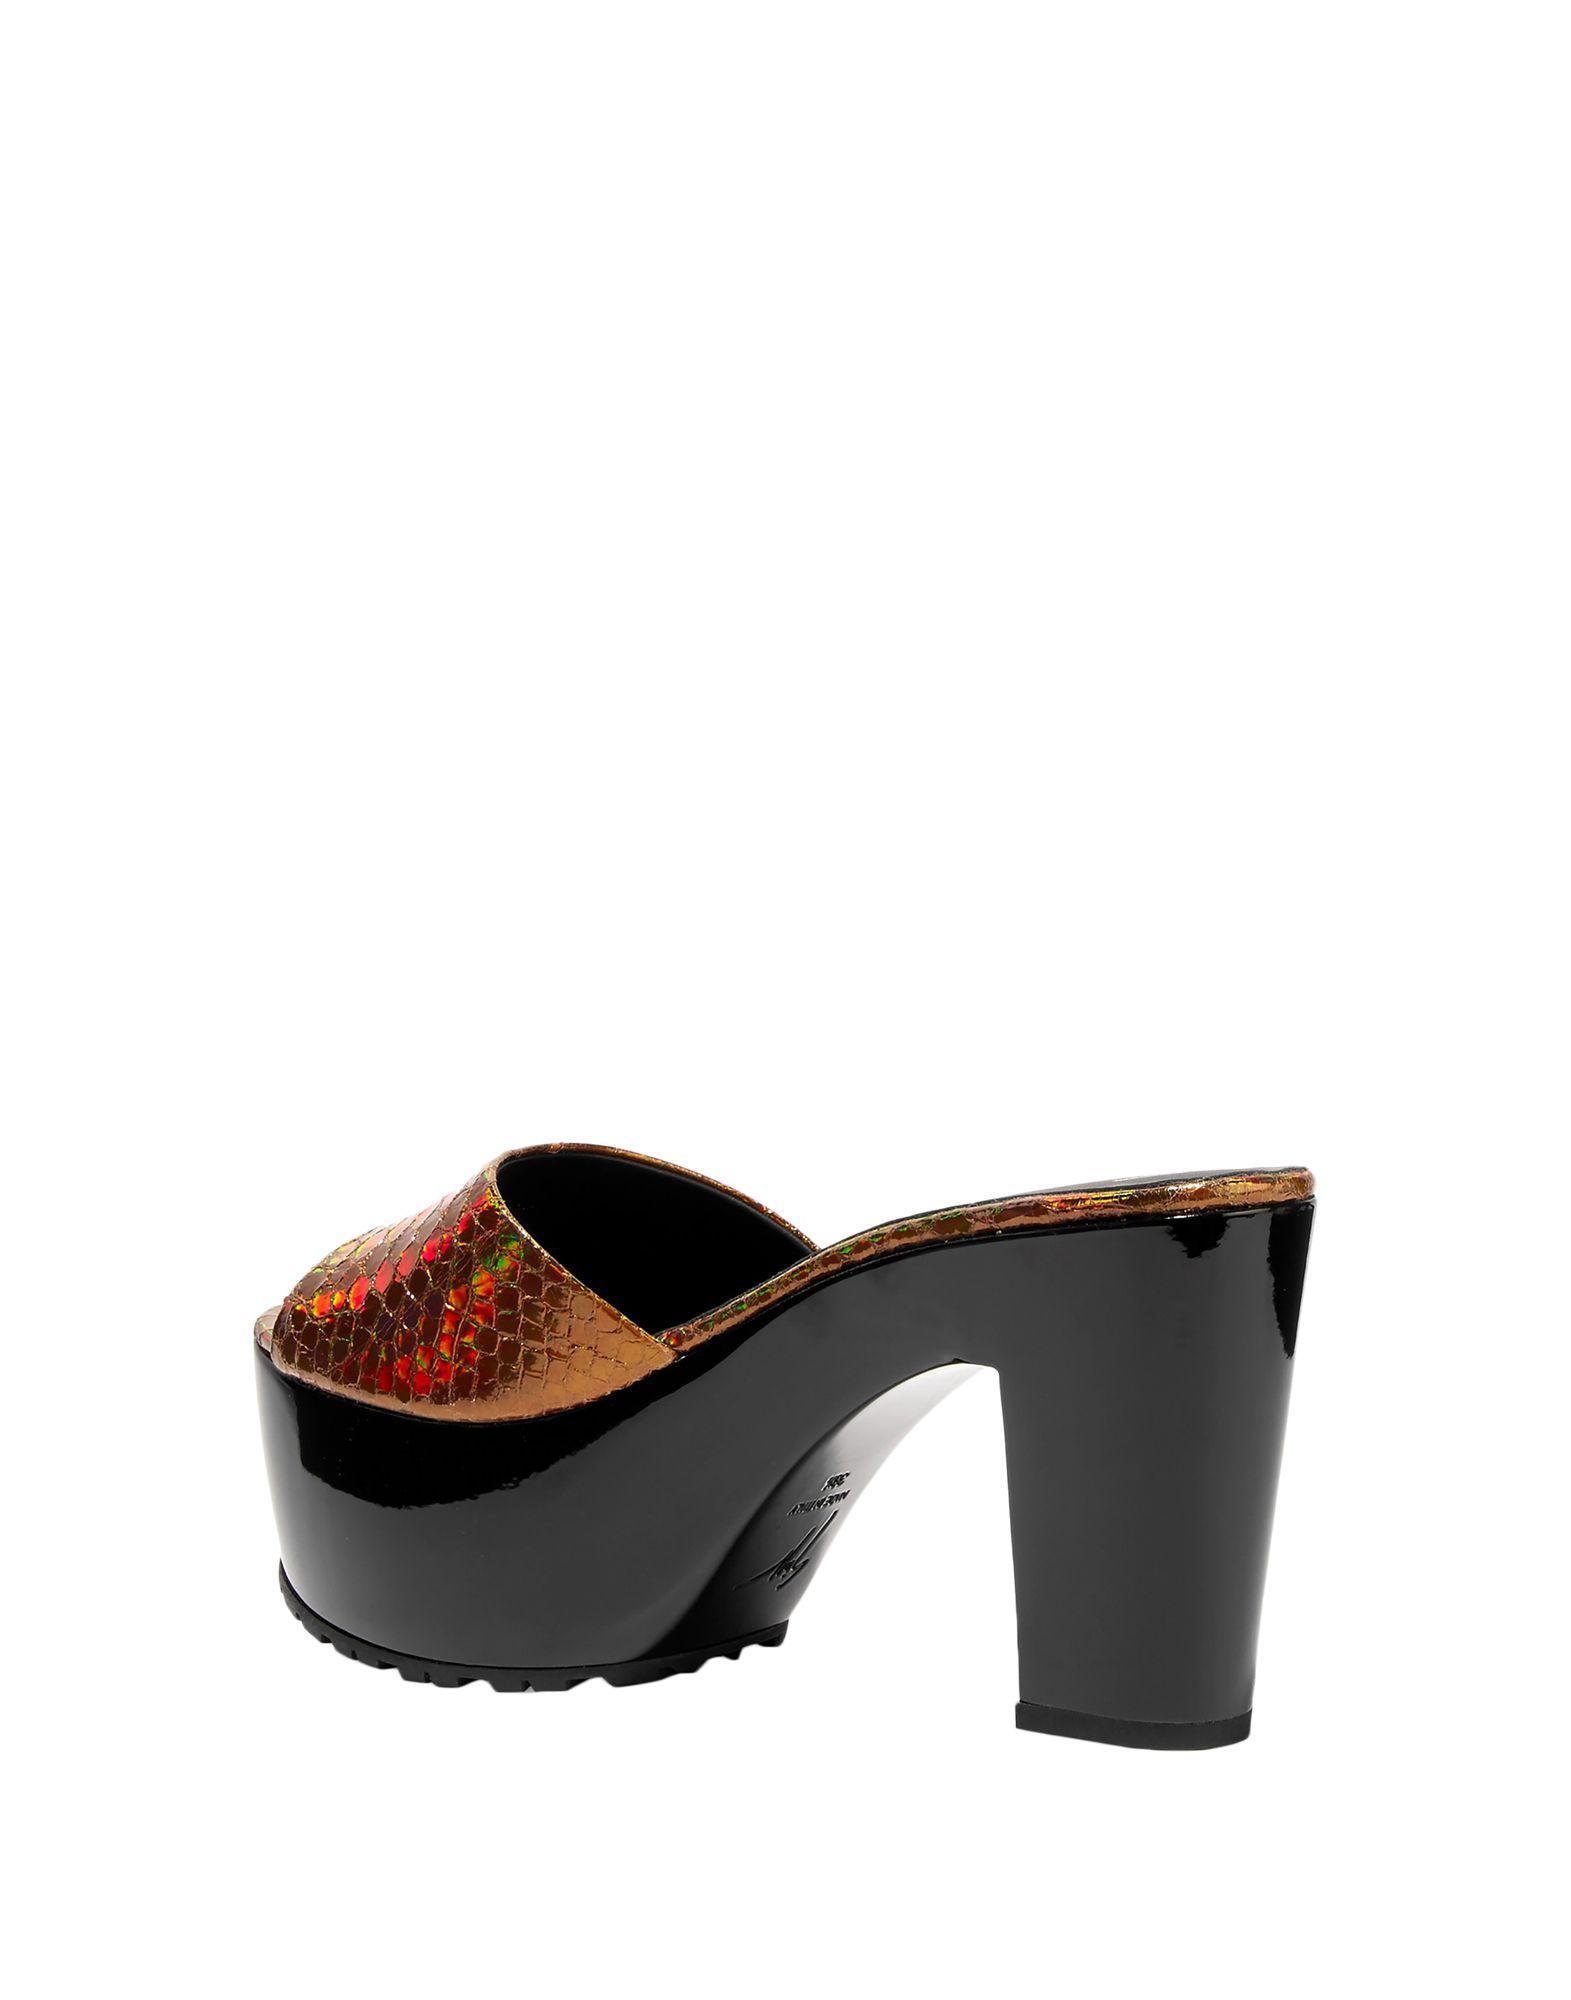 96054defa236 Lyst - Giuseppe Zanotti Sandals in Black